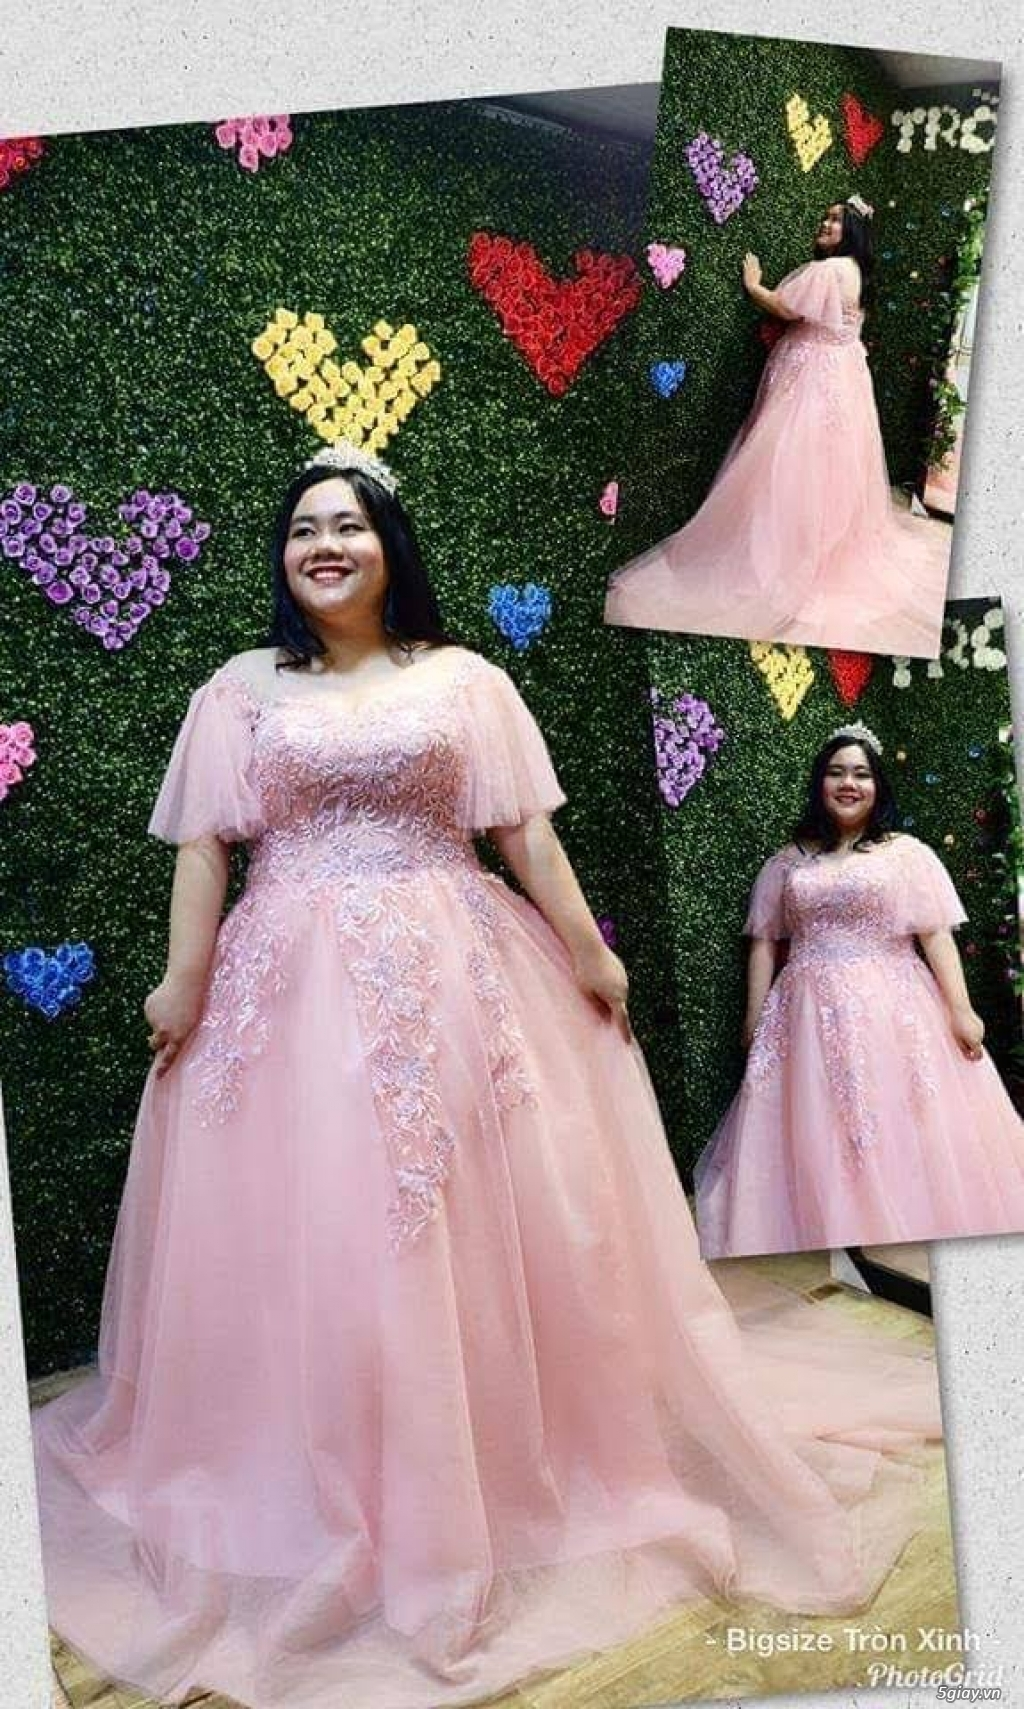 Áo cưới áo vest bigsize Tròn Xinh - 1